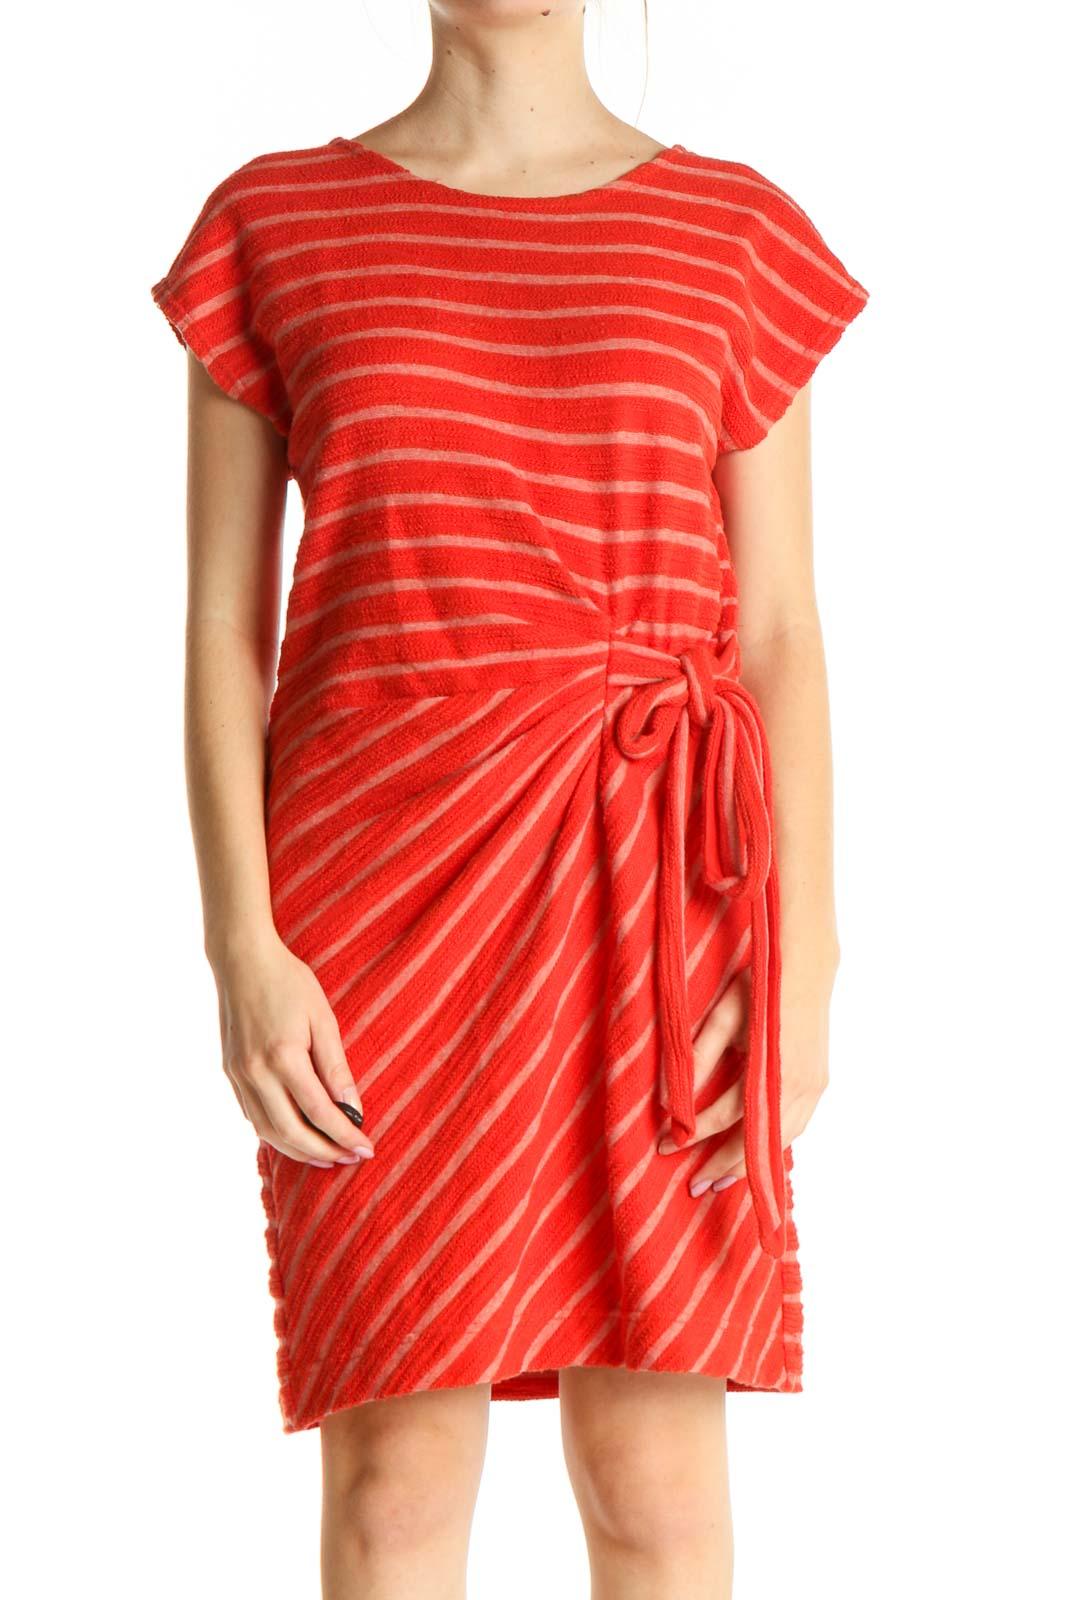 Orange Striped Casual Dress Front